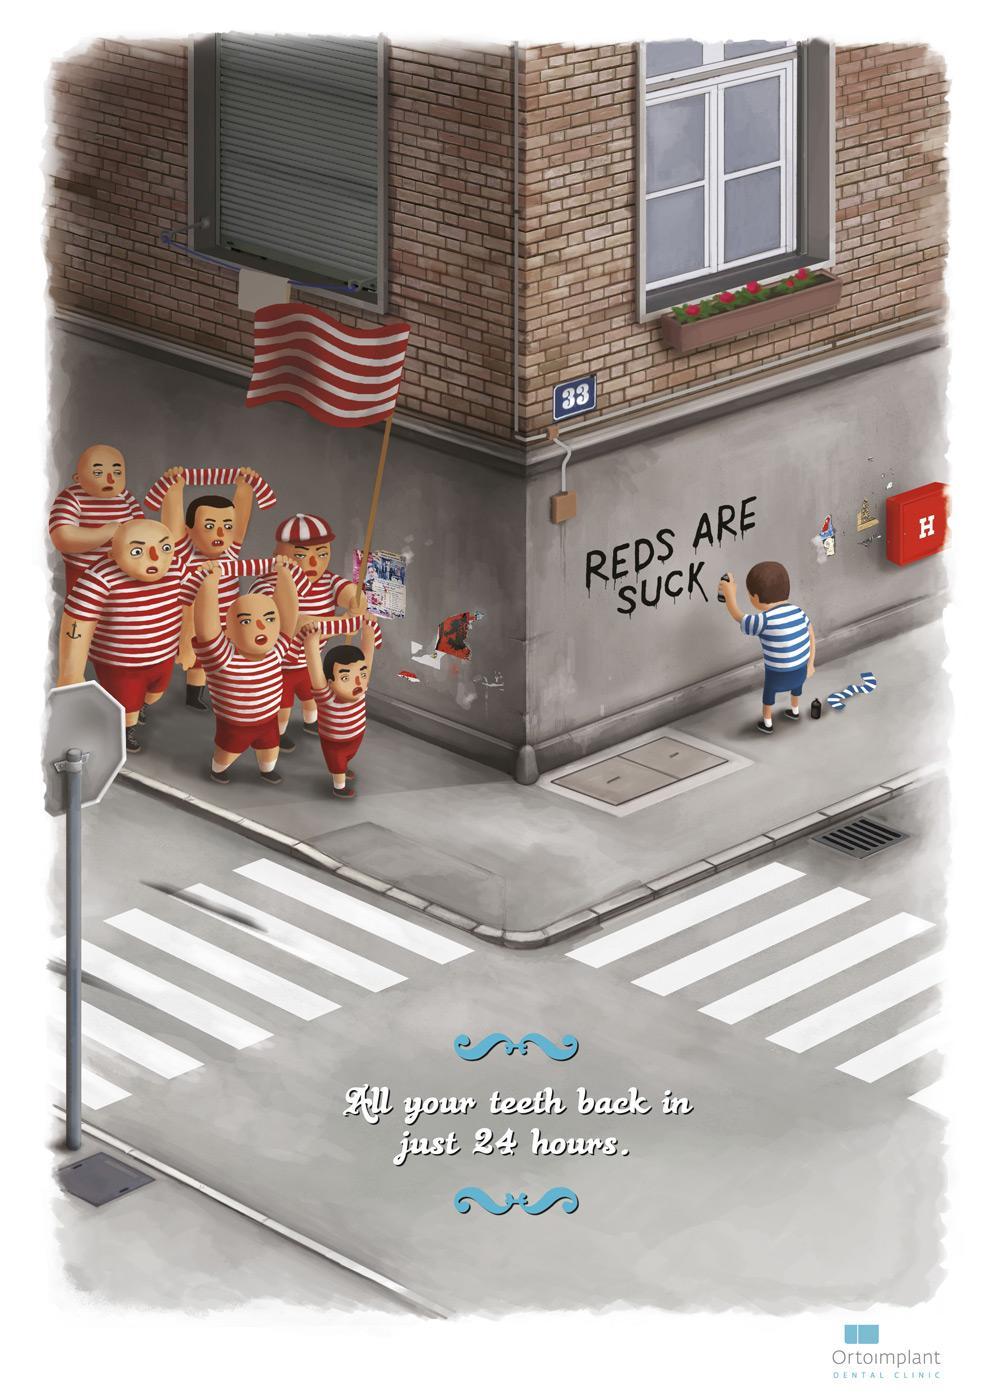 Ortoimplant Dental Clinic Print Ad -  Fans